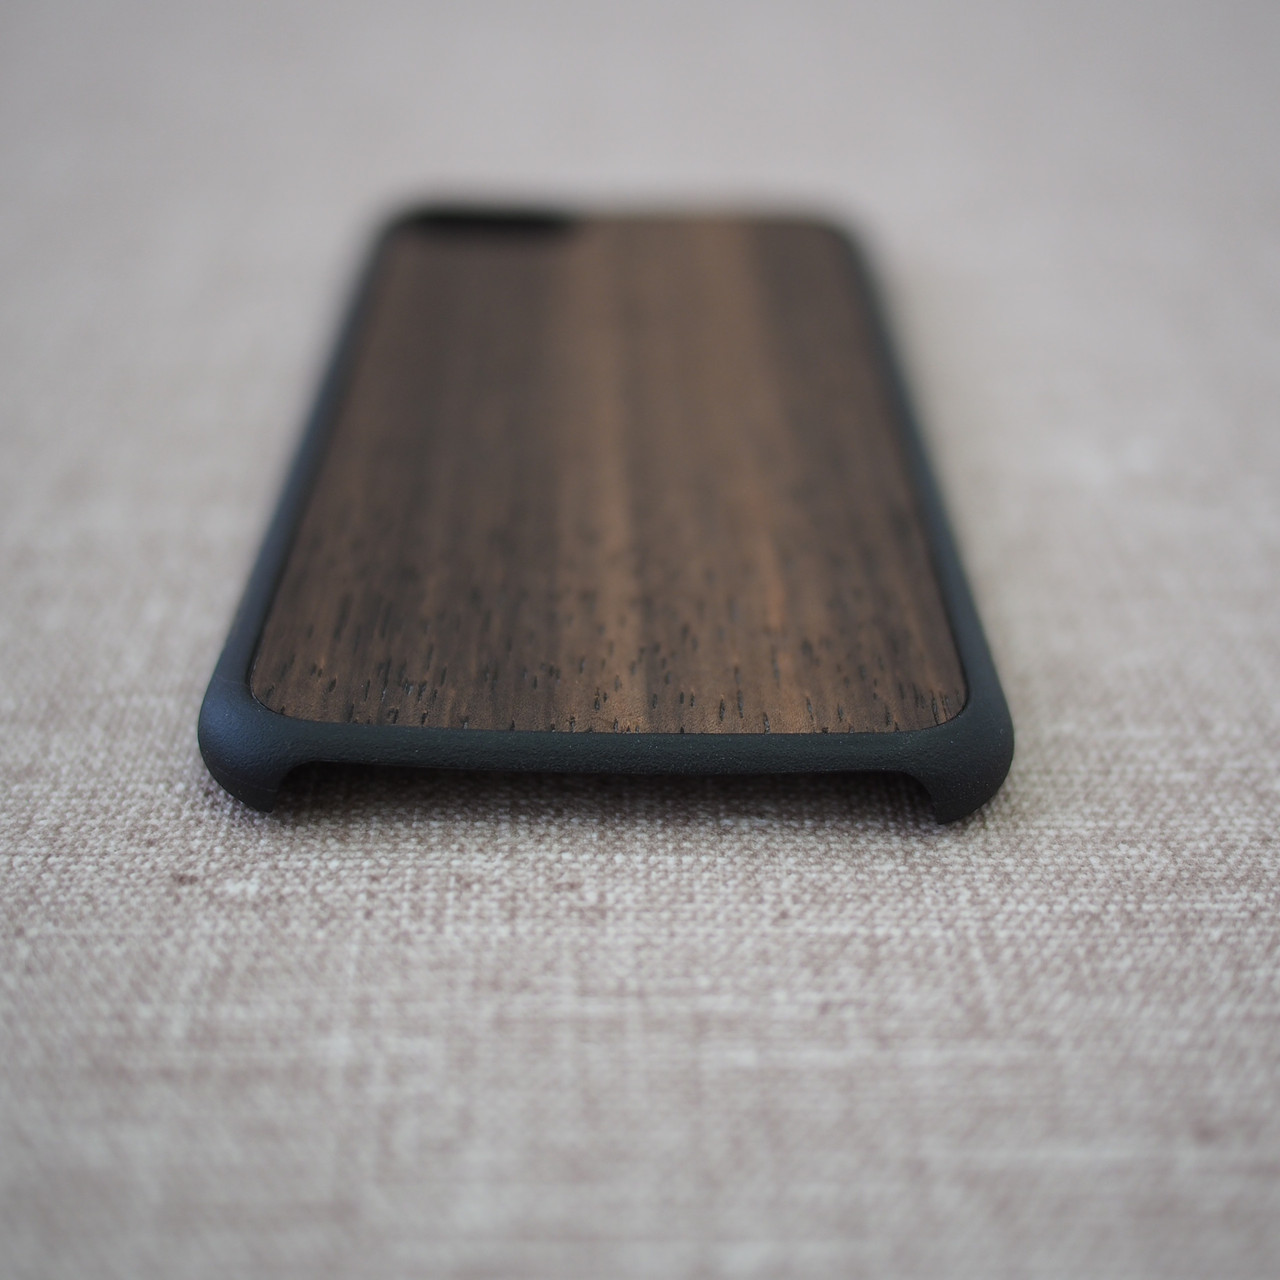 Ozaki O!coat 0.3 iPhone 7 Jelly+Wood Для телефона